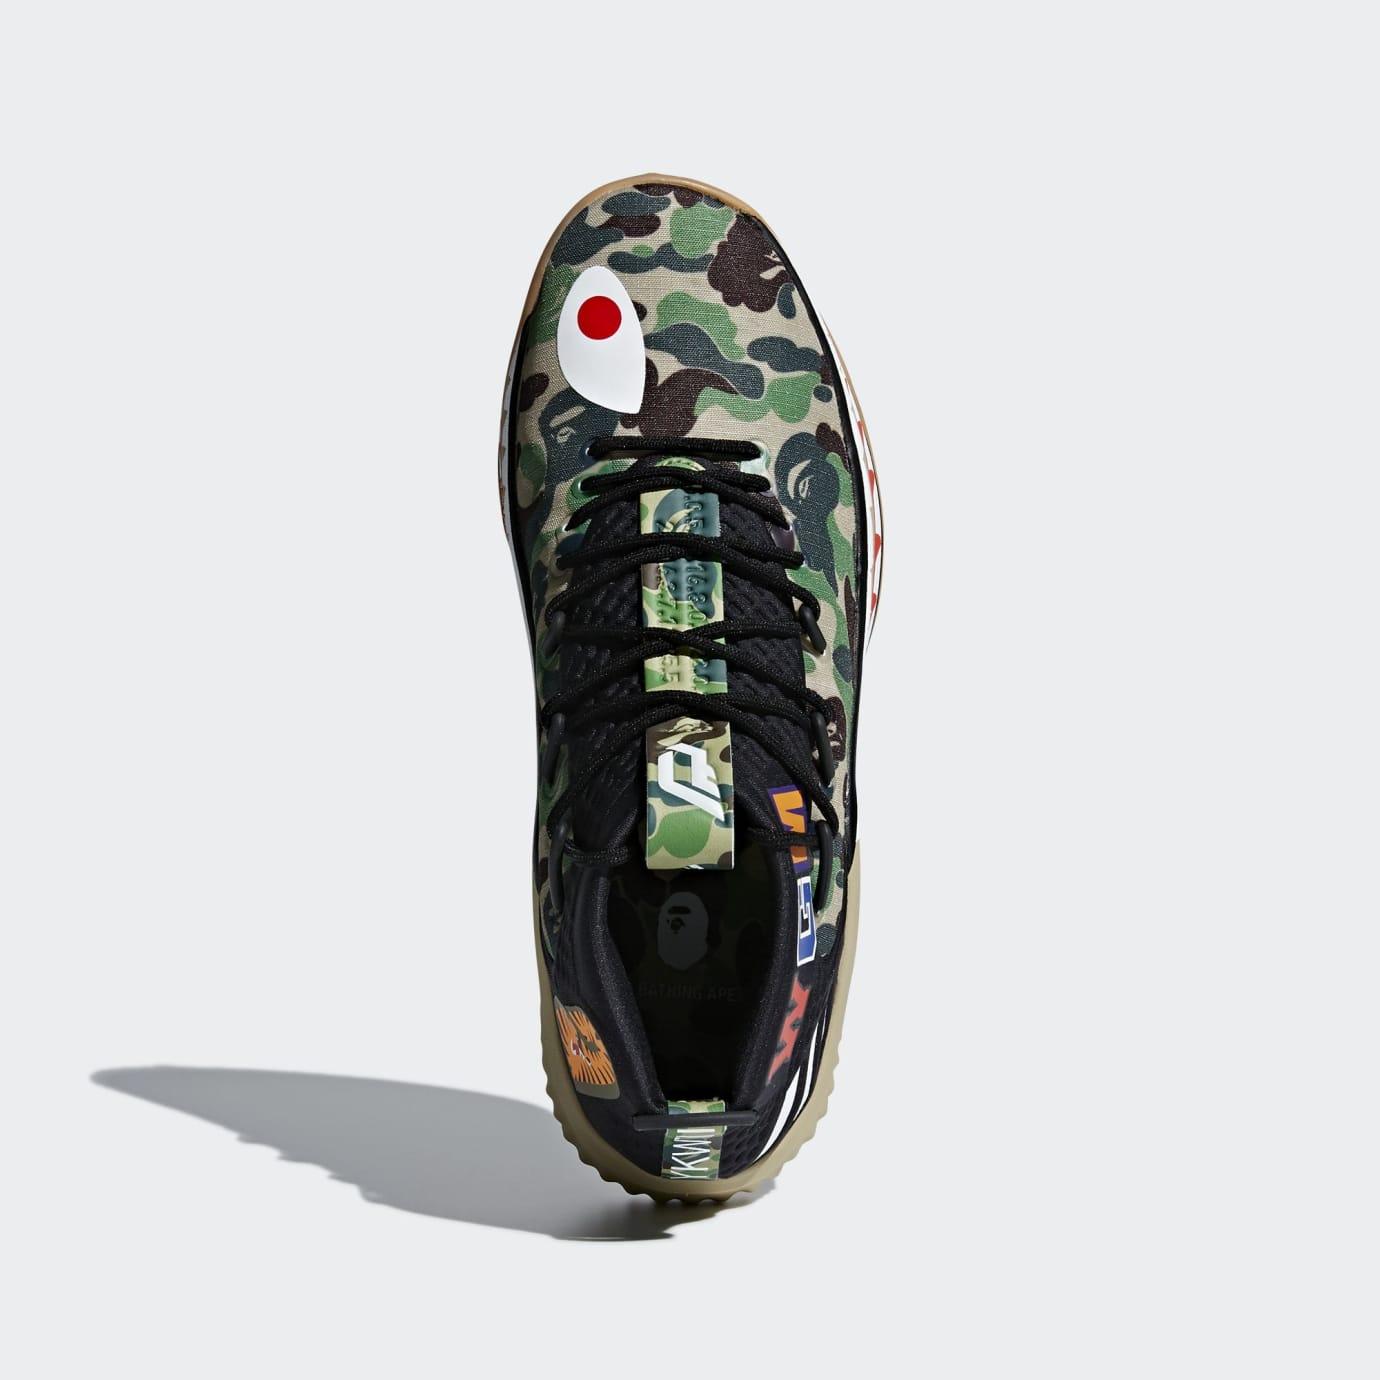 huge discount 53bec 8de90 Image via Adidas BAPE x Adidas Dame 4  Green Camo  AP9974 (Top)